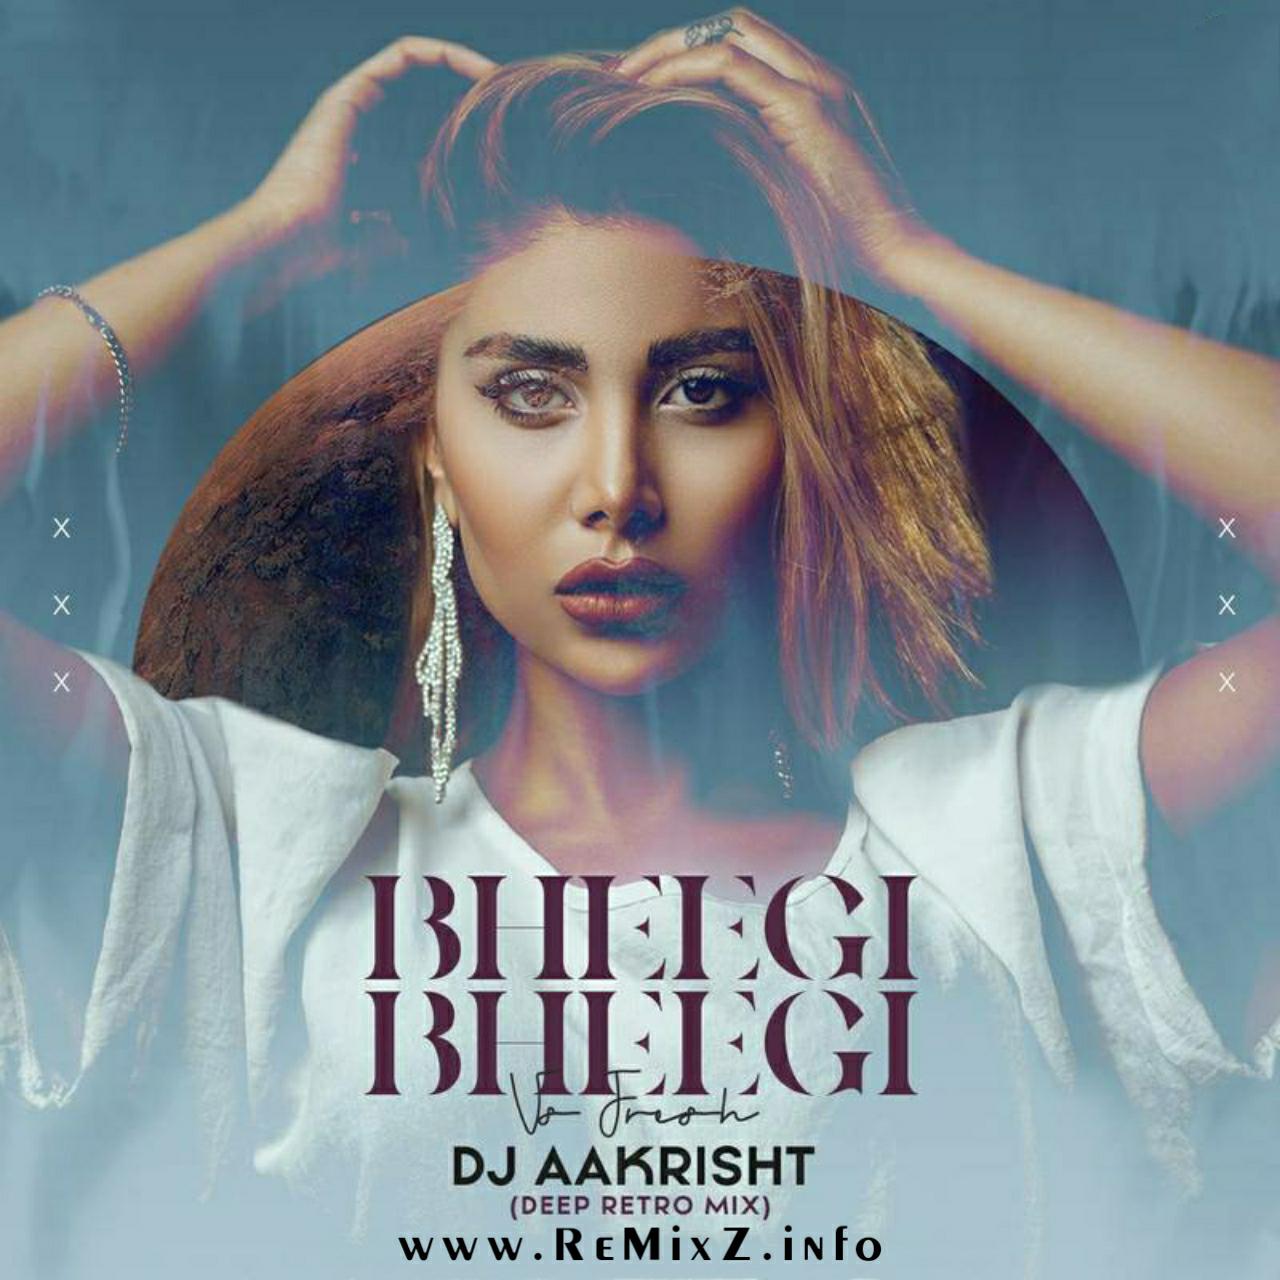 Bheegi-Bheegi-Vs-Fresh-Deep-Retro-Mix-DJ-Aakrisht.jpg